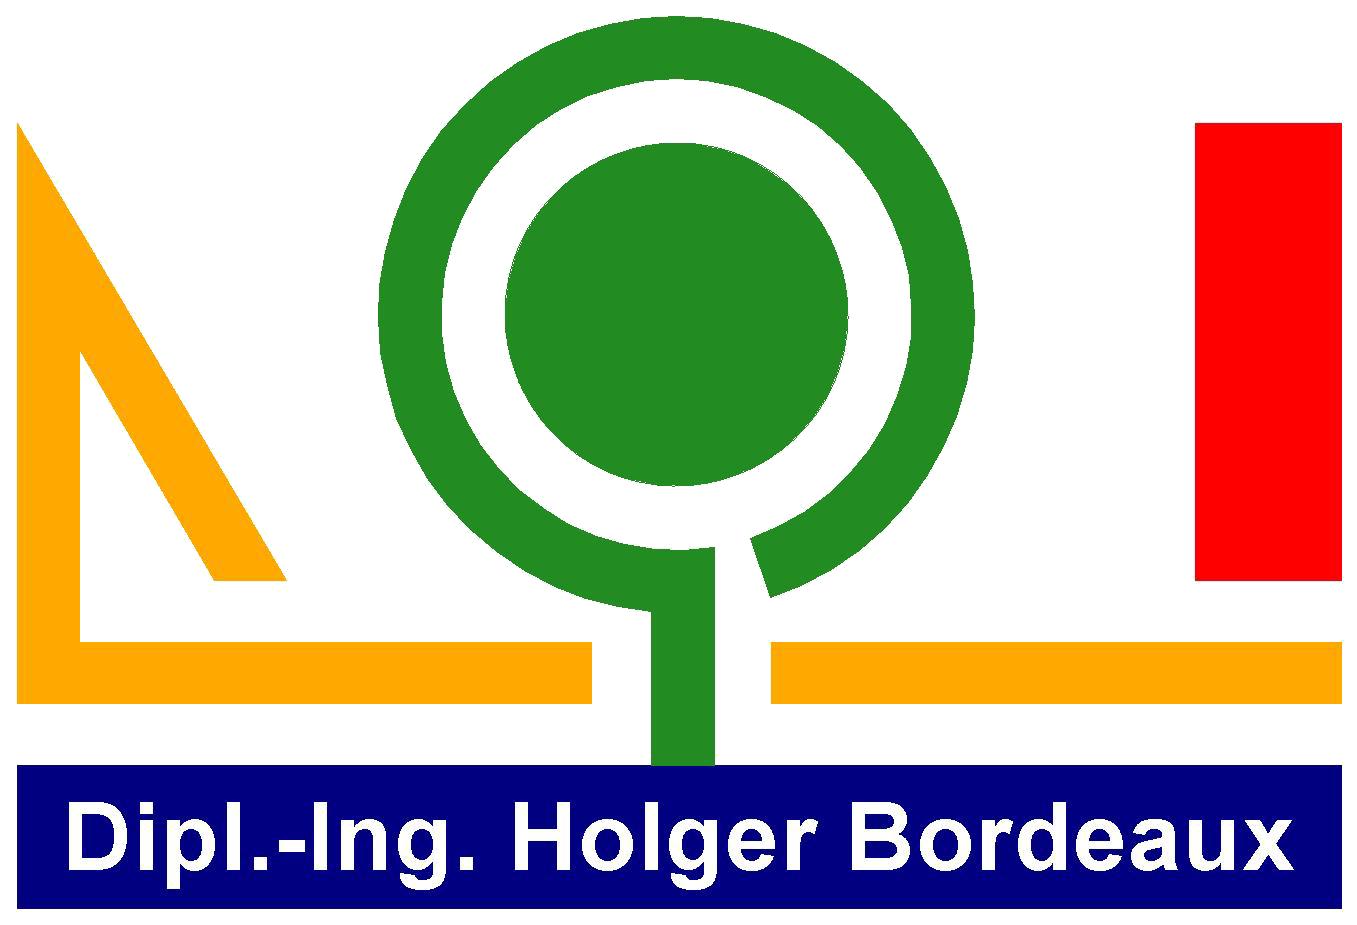 Jpalandt.de – Ingenieur- und Landschaftsplanungsbüro Palandt